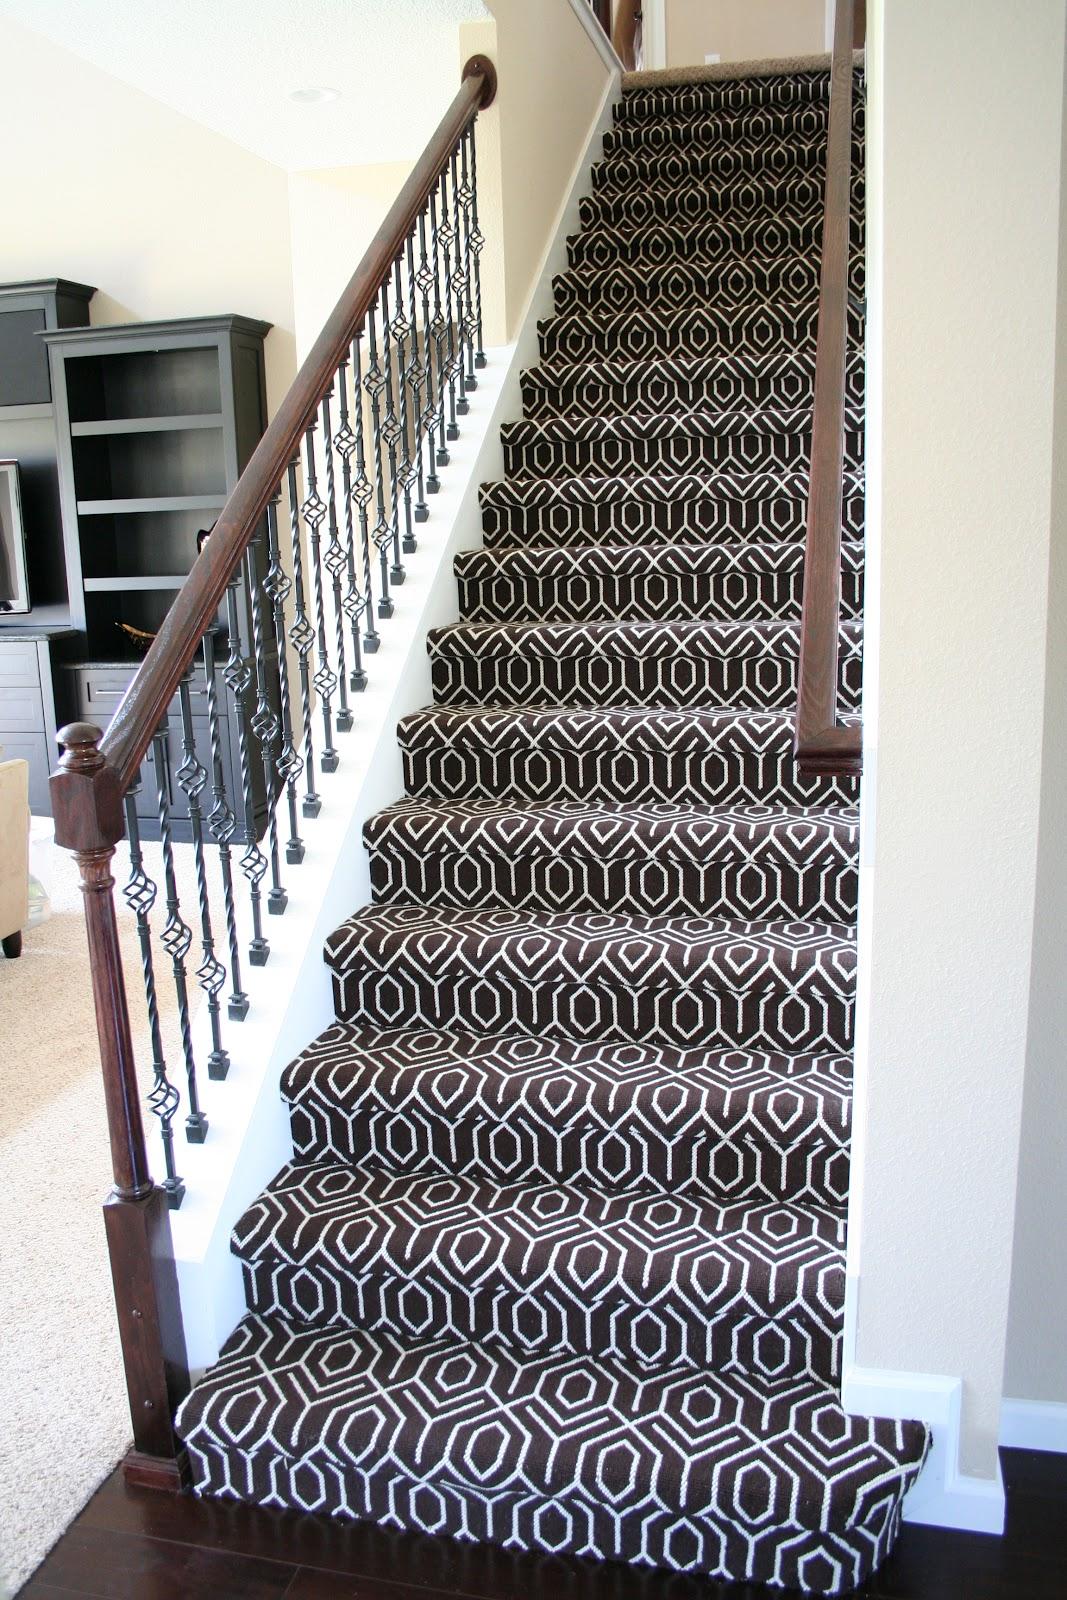 Vernon Volumes: Stair carpet